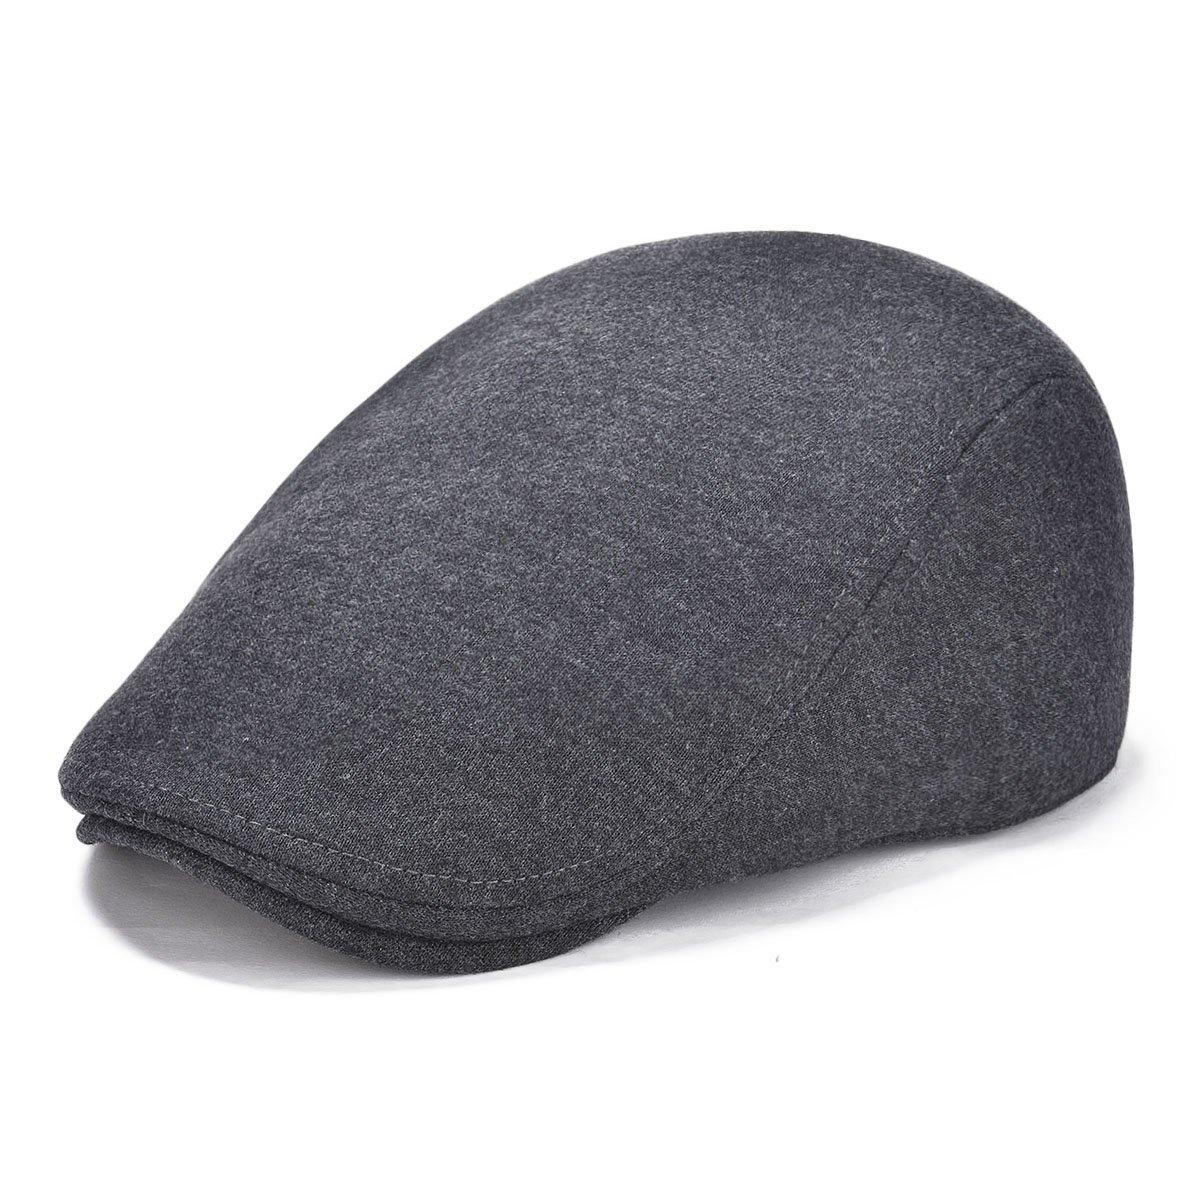 VOBOOM Men s Cotton Flat Ivy Gatsby Newsboy Driving Hat Cap 039 product  image e83bab0f30dc